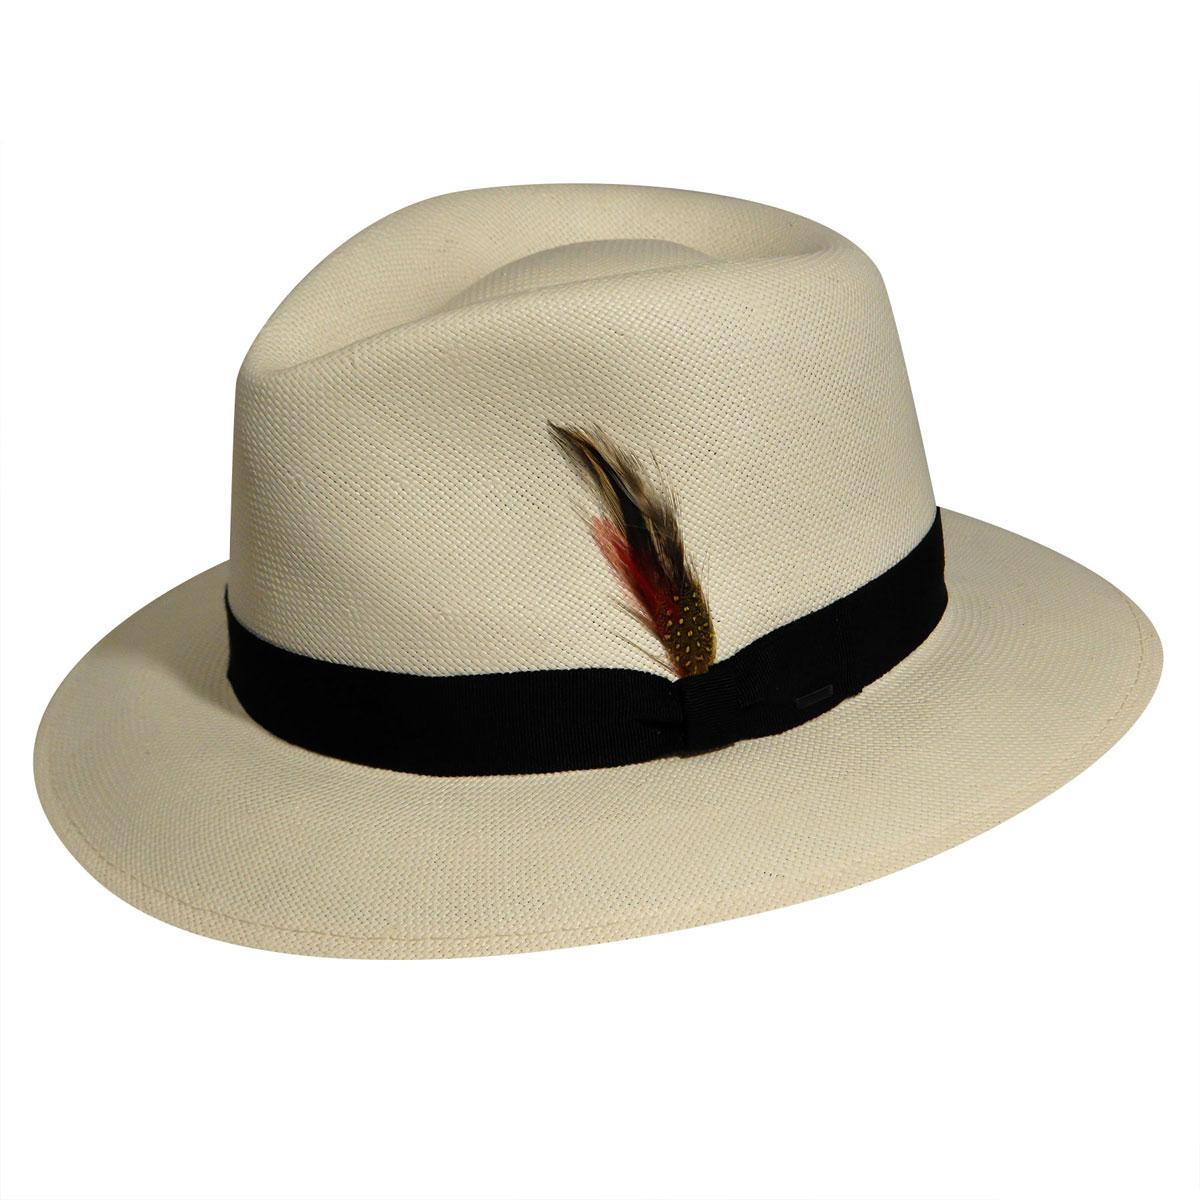 1940s Mens Hats | Fedora, Homburg, Pork Pie Hats Konrath LitestrawFedora $160.00 AT vintagedancer.com